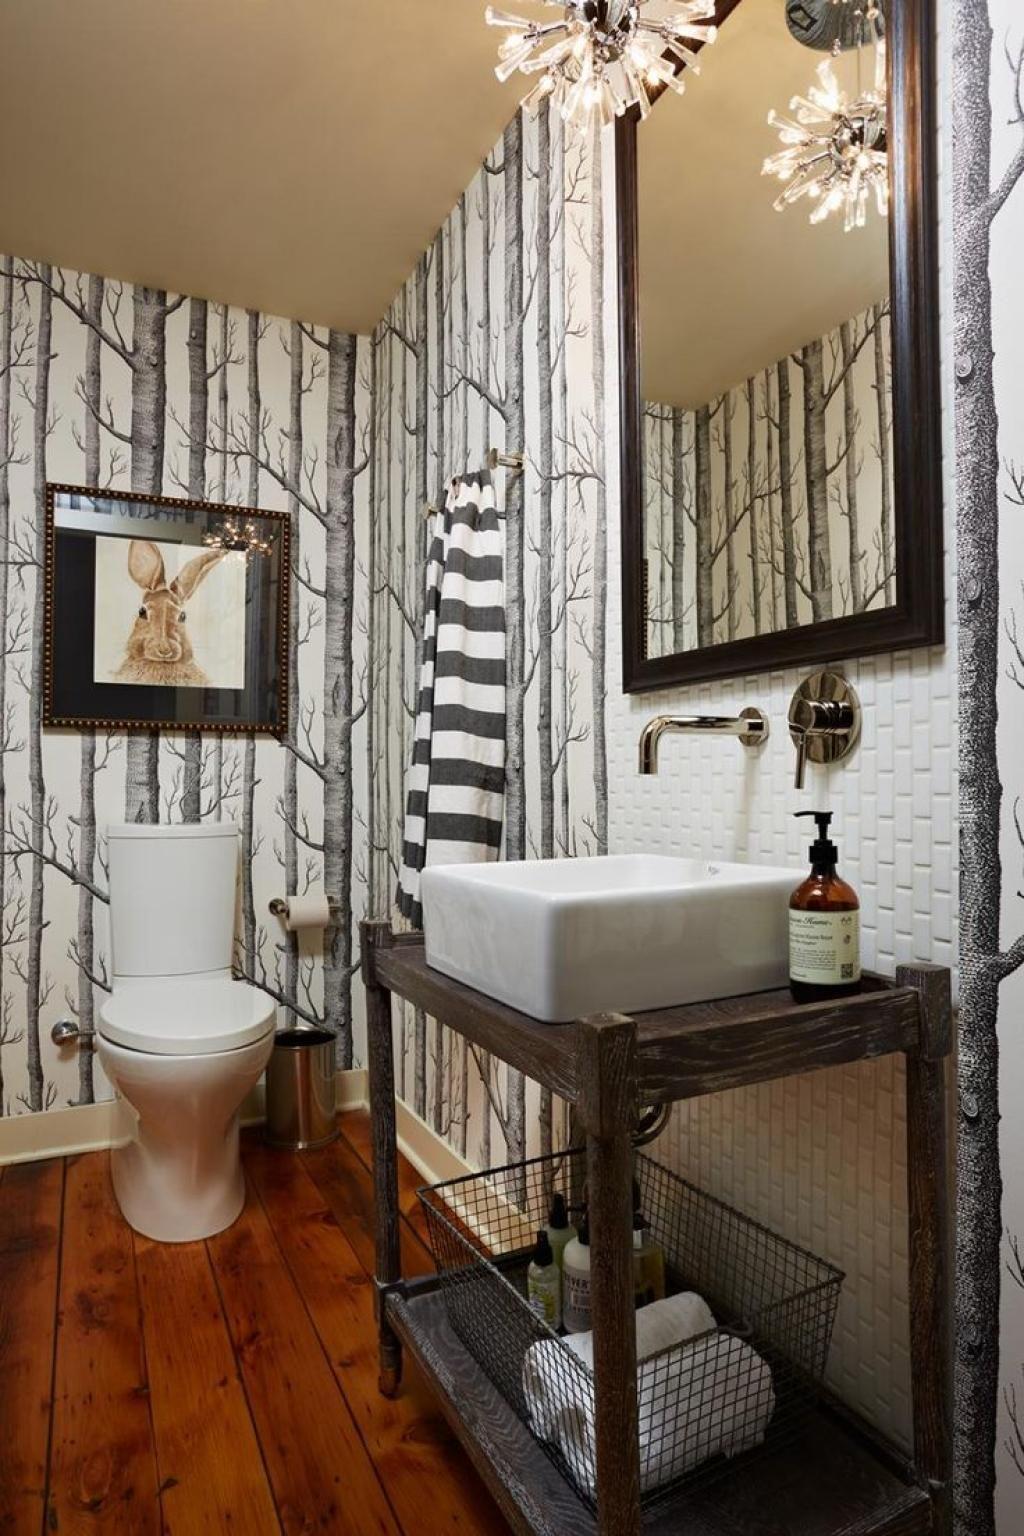 Dry Wood Forest Bathroom Wallpaper Ideas For Small Modern Bathroom Fascinating Small Bathroom Wallpaper Ideas Design Decoration